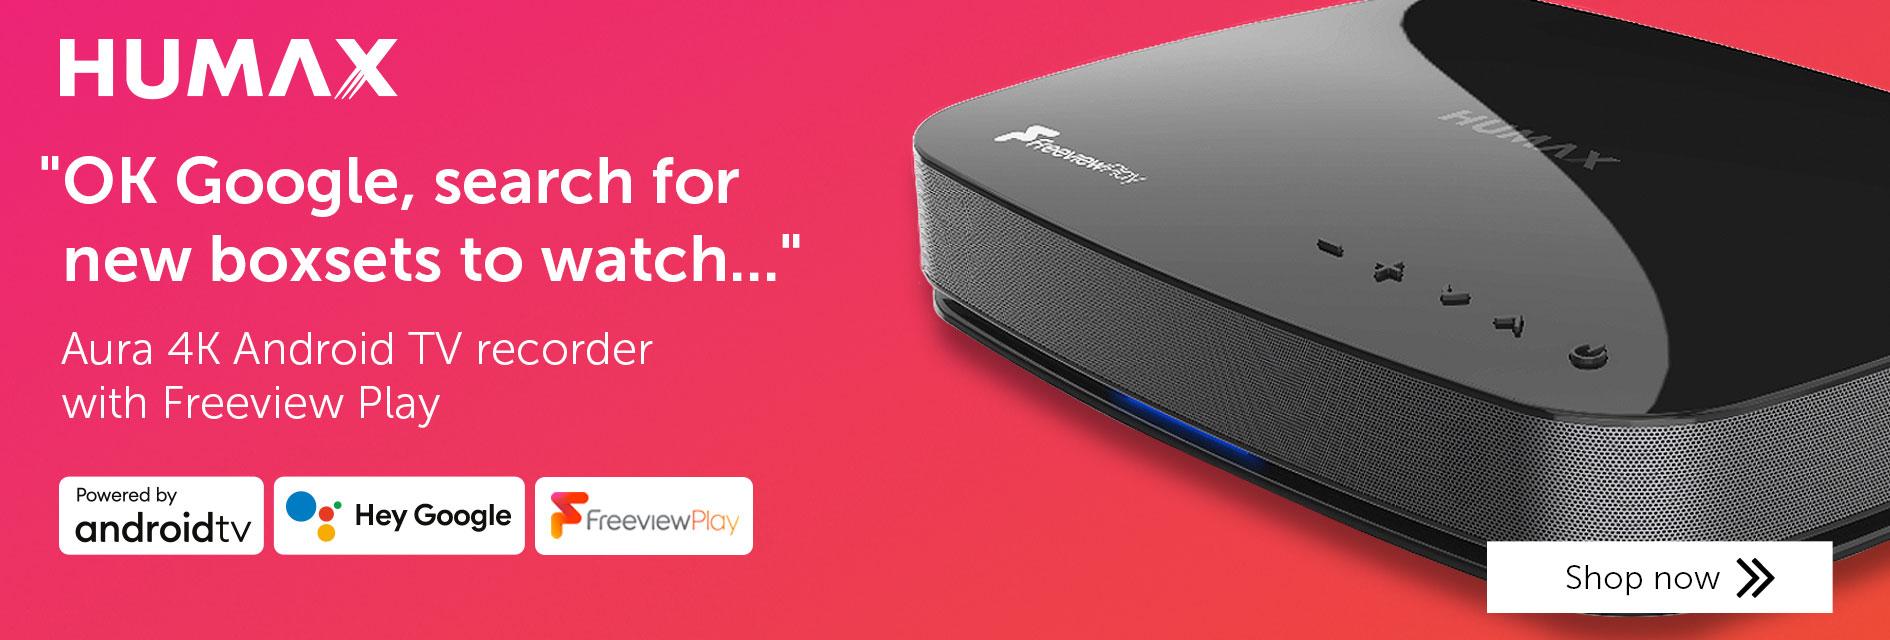 Humax Aura 4K Android TV recorder